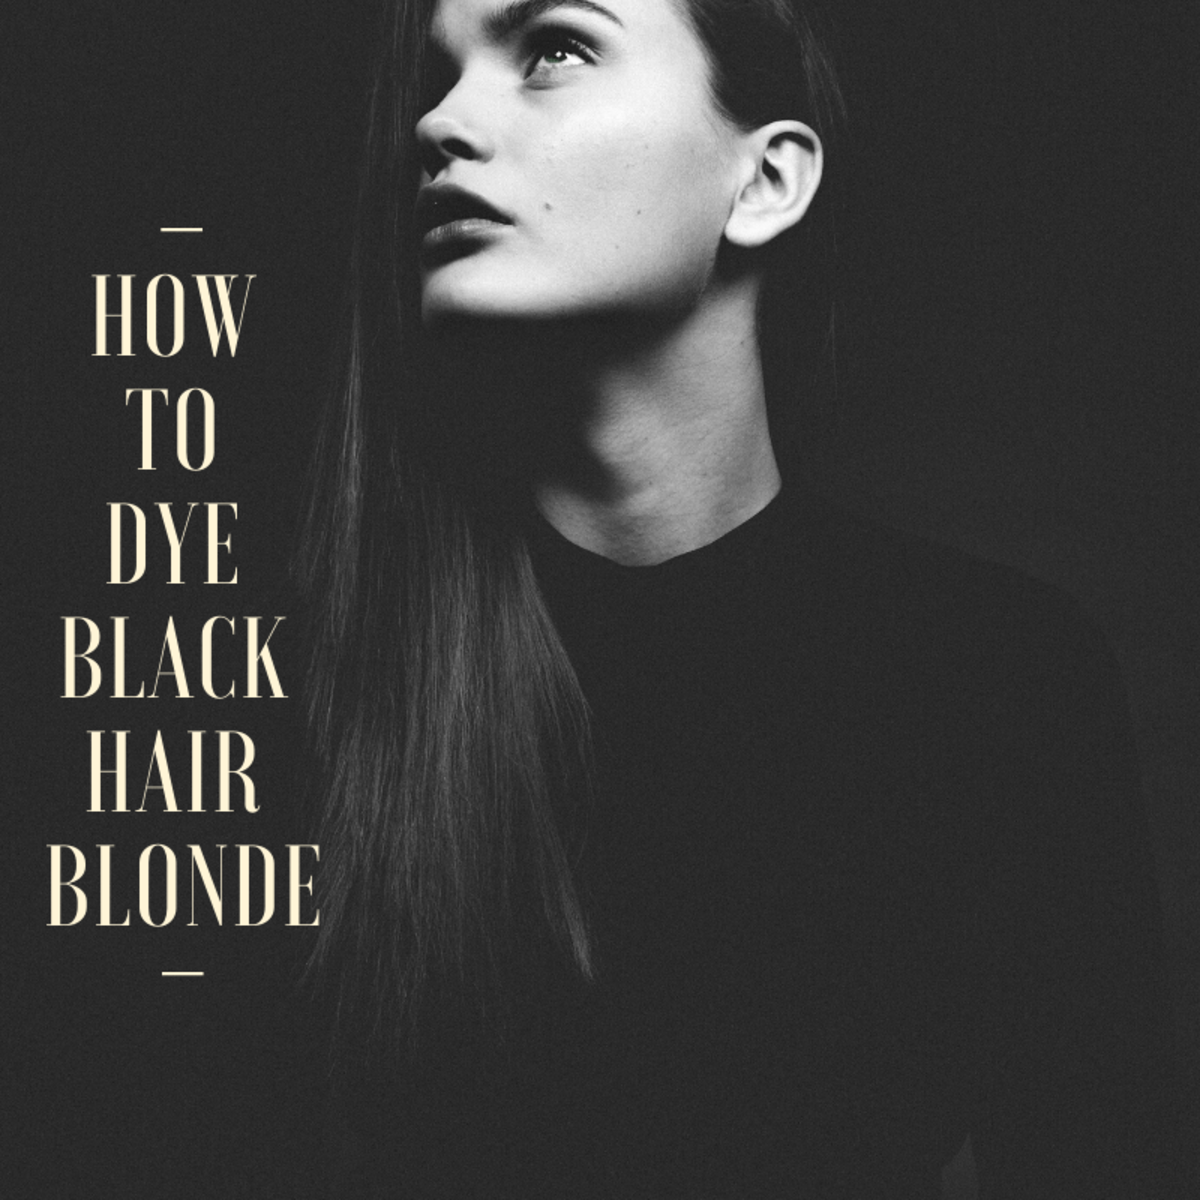 How to Dye Black Hair Blonde